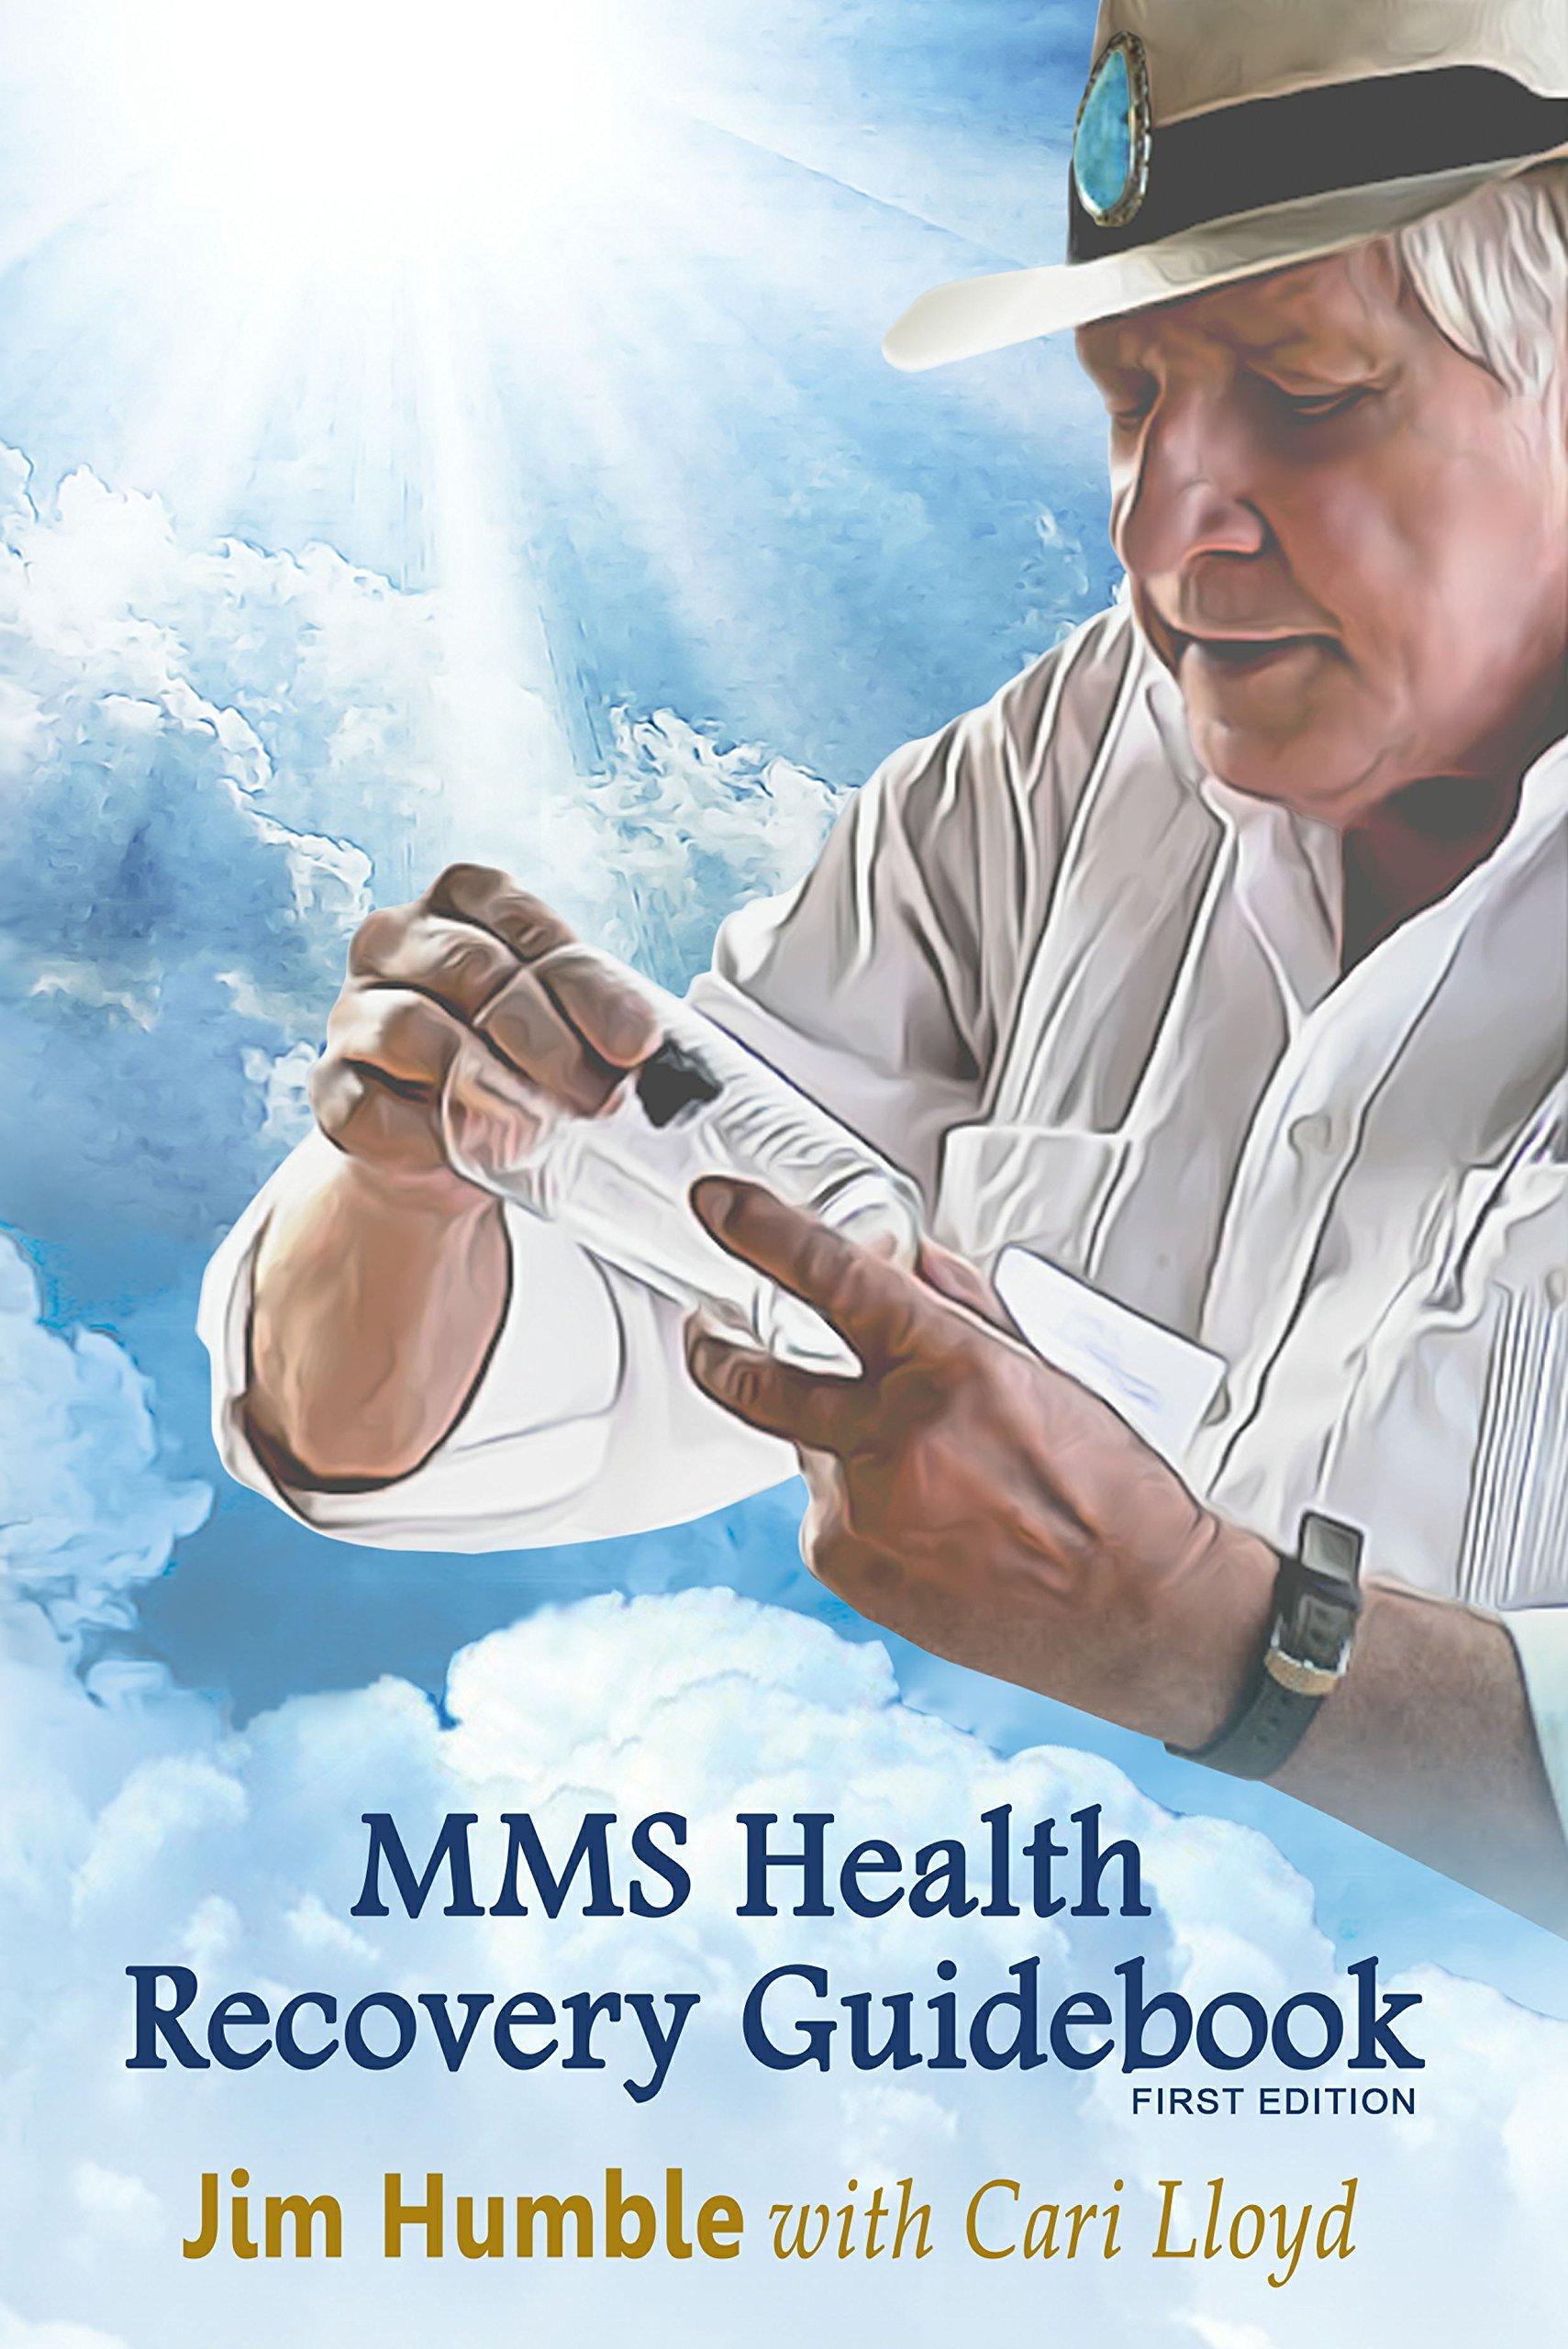 MMS HEALTH RECOVERY GUIDEBOOK 1st Edition Jim Humble: Jim Humble